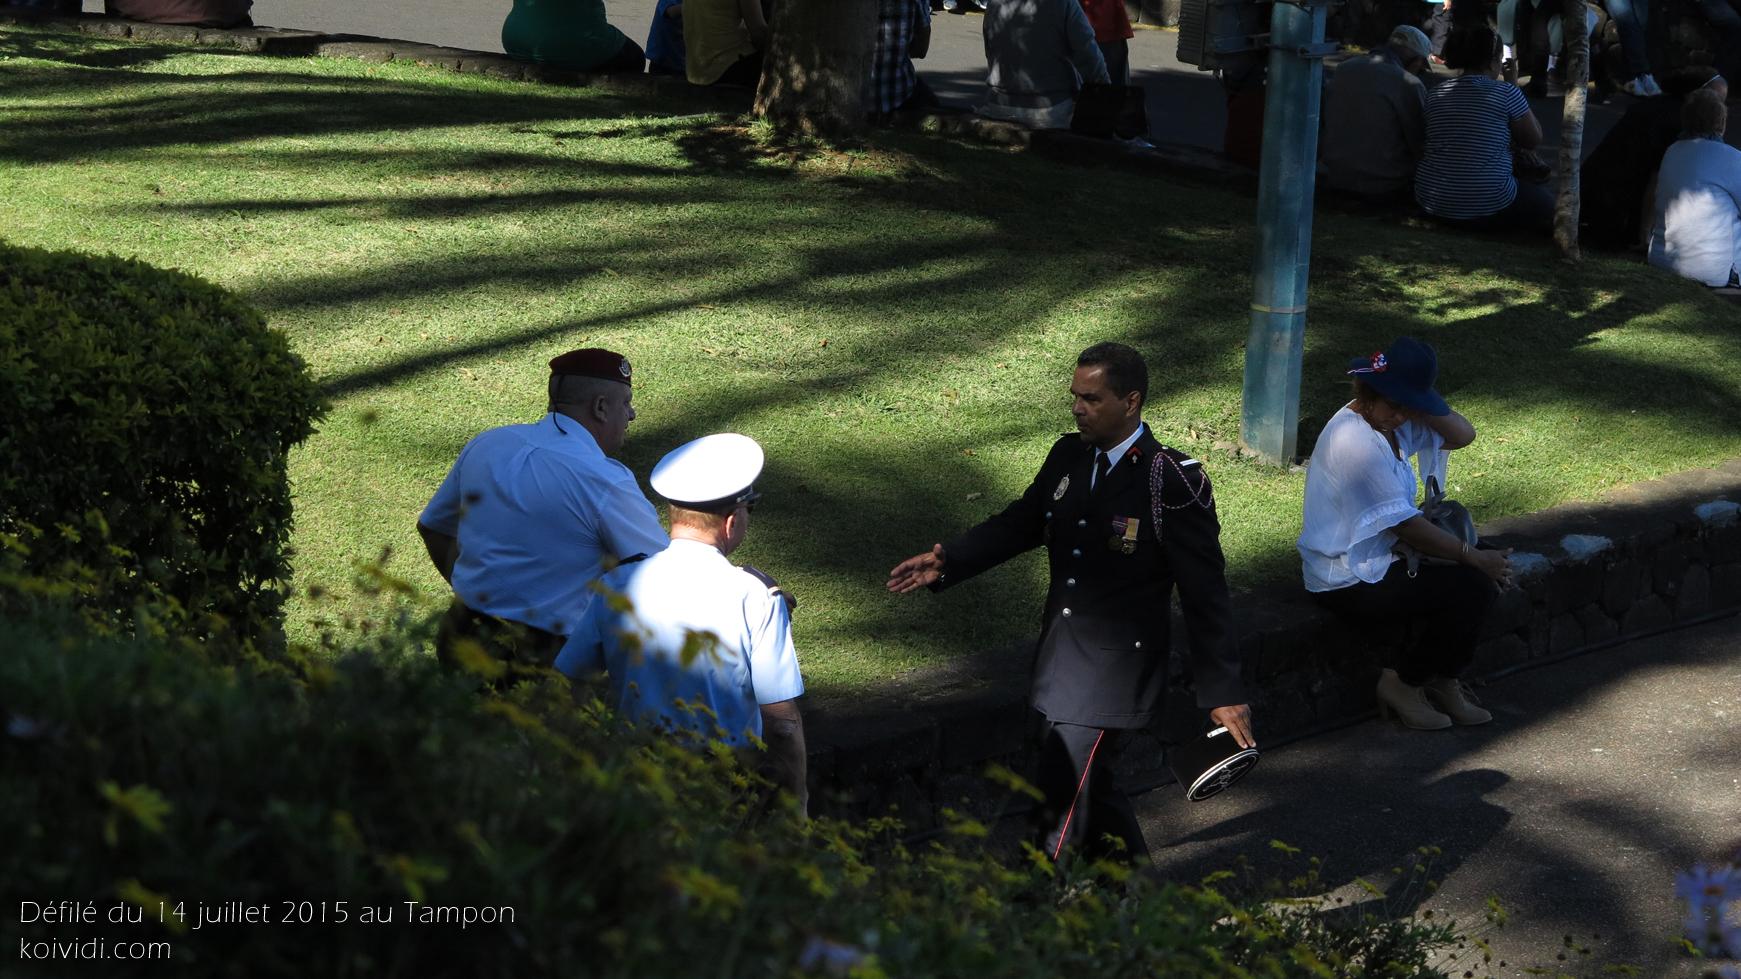 14 juillet 2015 ville Tampon